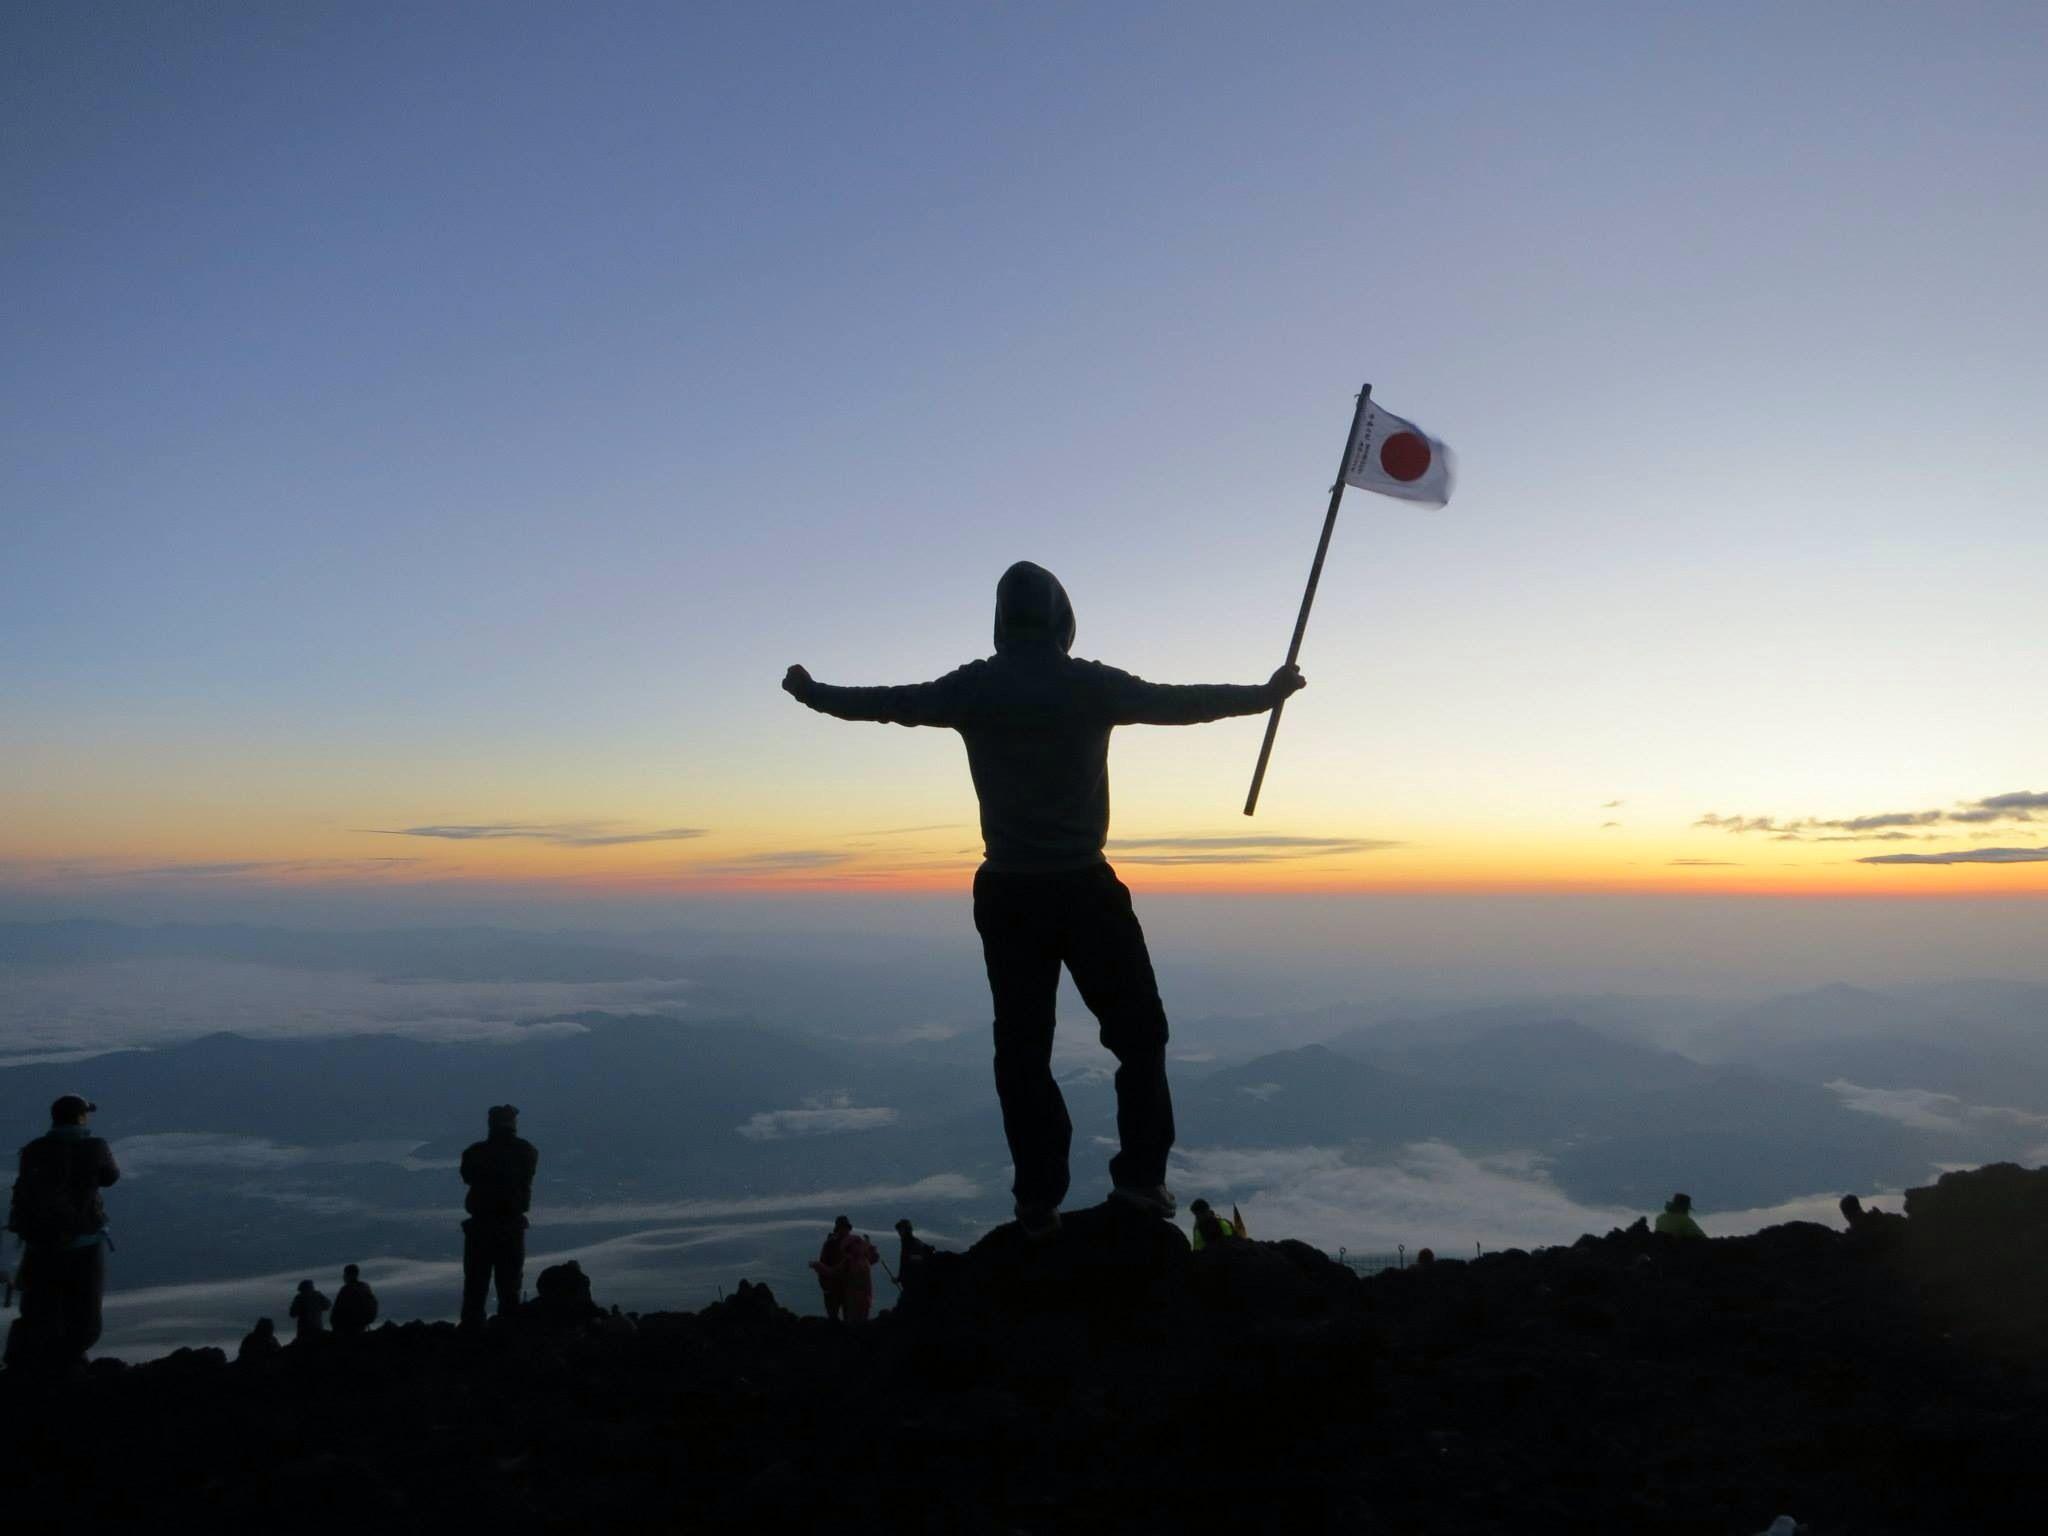 at the top of Mount Fuji, Japan